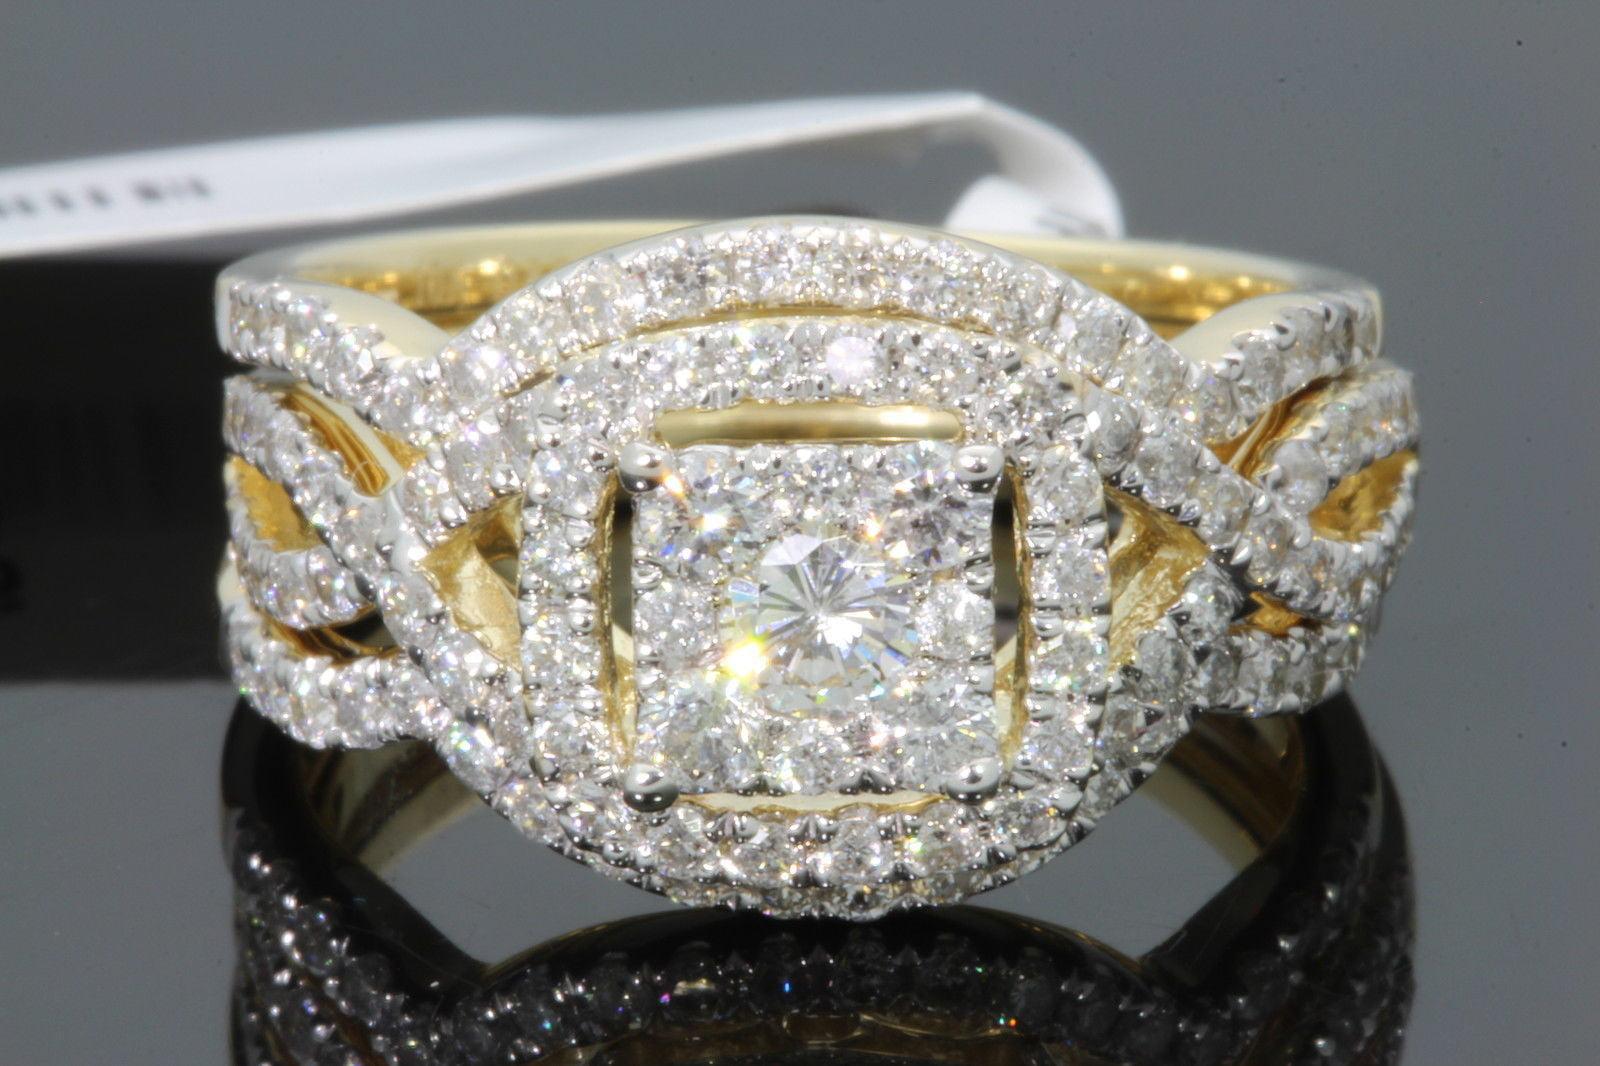 10K YELLOW GOLD 1.43 CARAT WOMENS REAL DIAMOND ENGAGEMENT RING WEDDING BANDS SET by Wholesale Diamonds